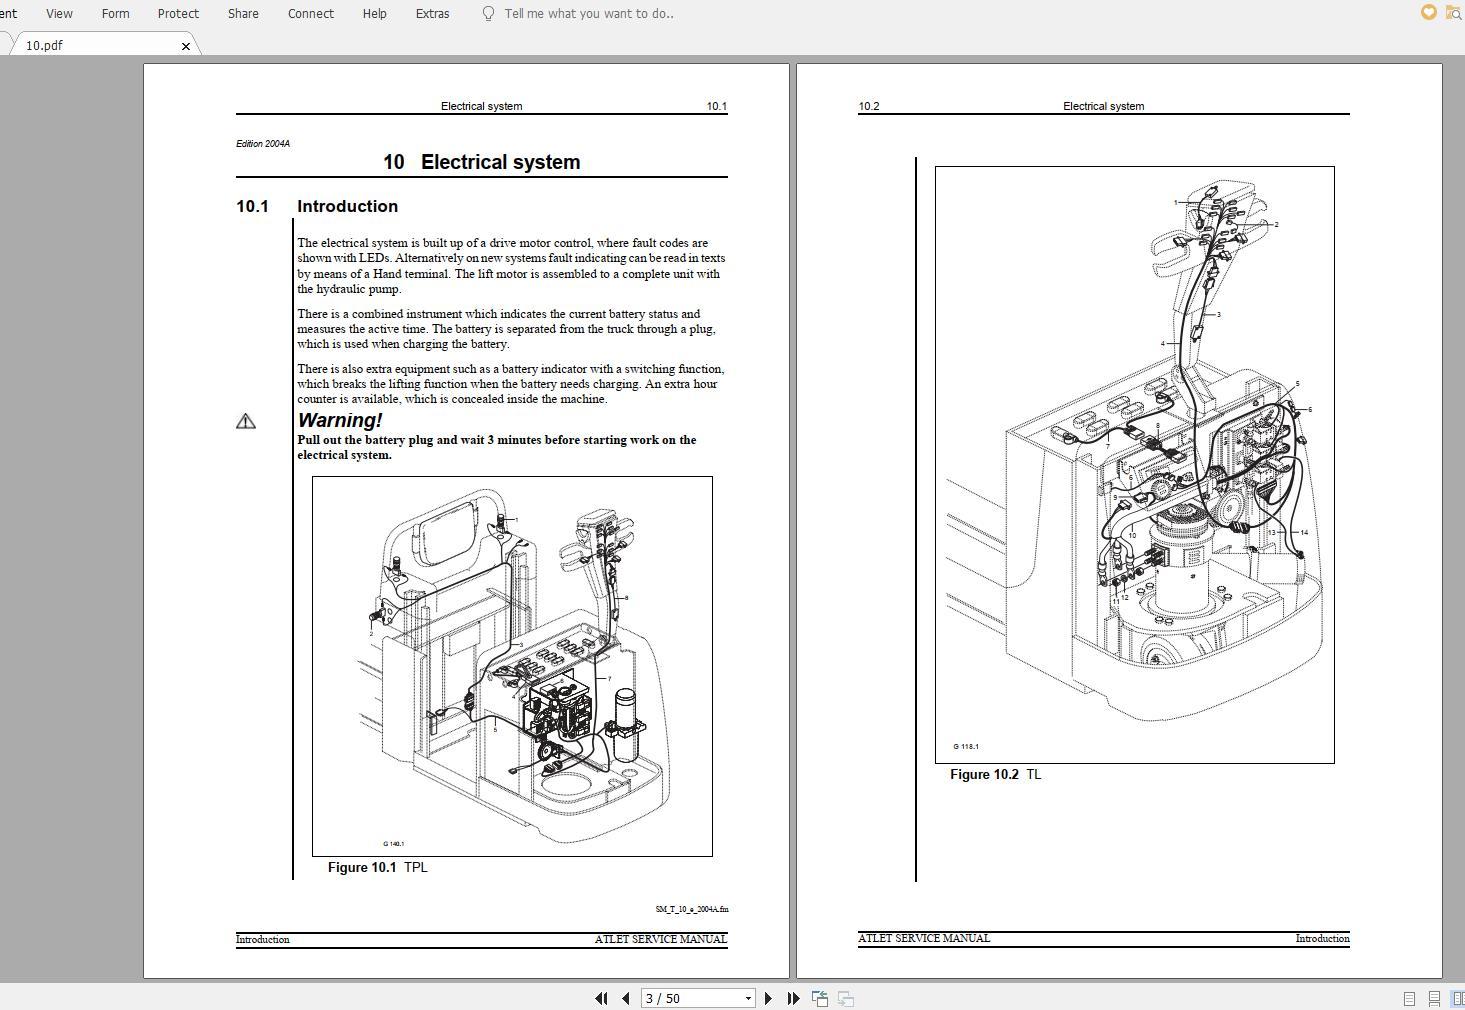 Nissan_Forklift_Warehouse_T_Series_005879_Service_ManualEN_4